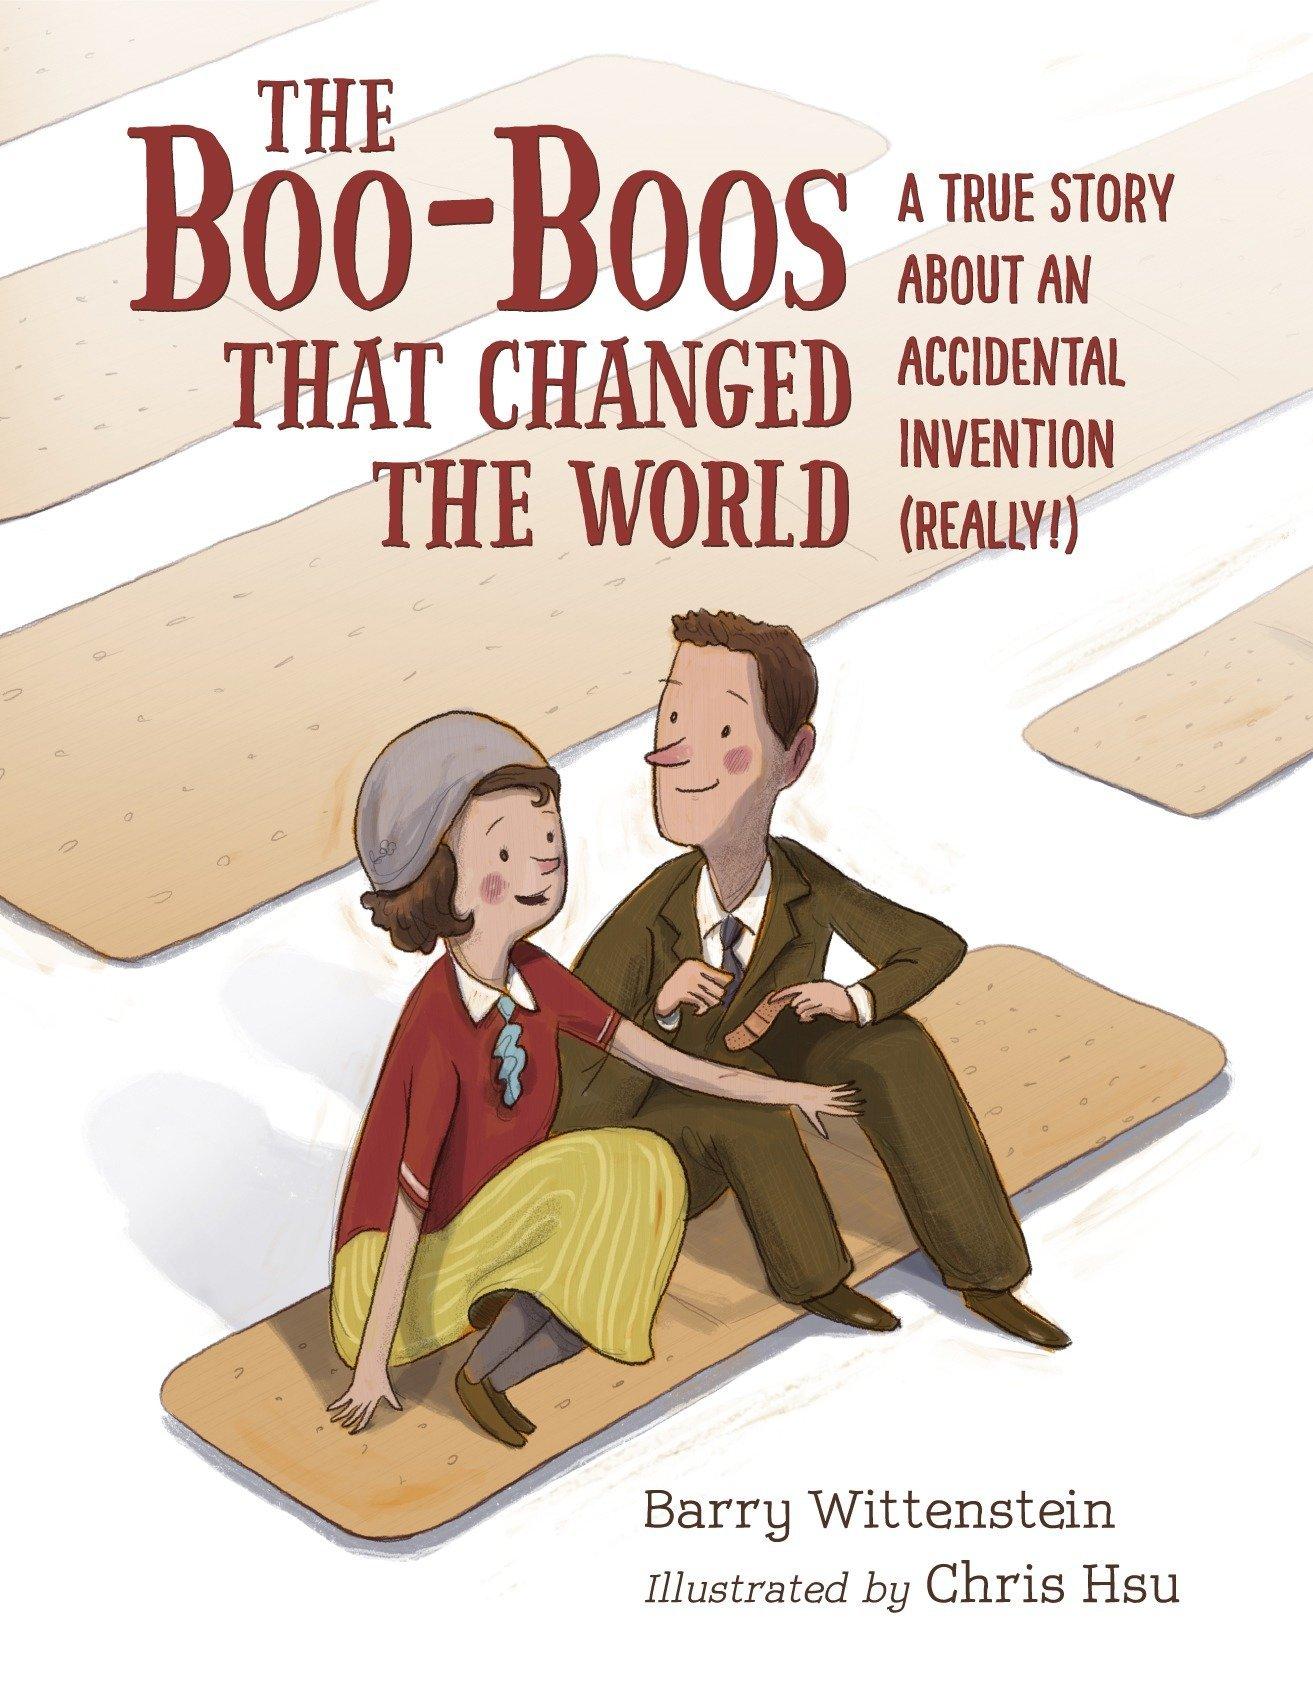 The Boo-Boos That